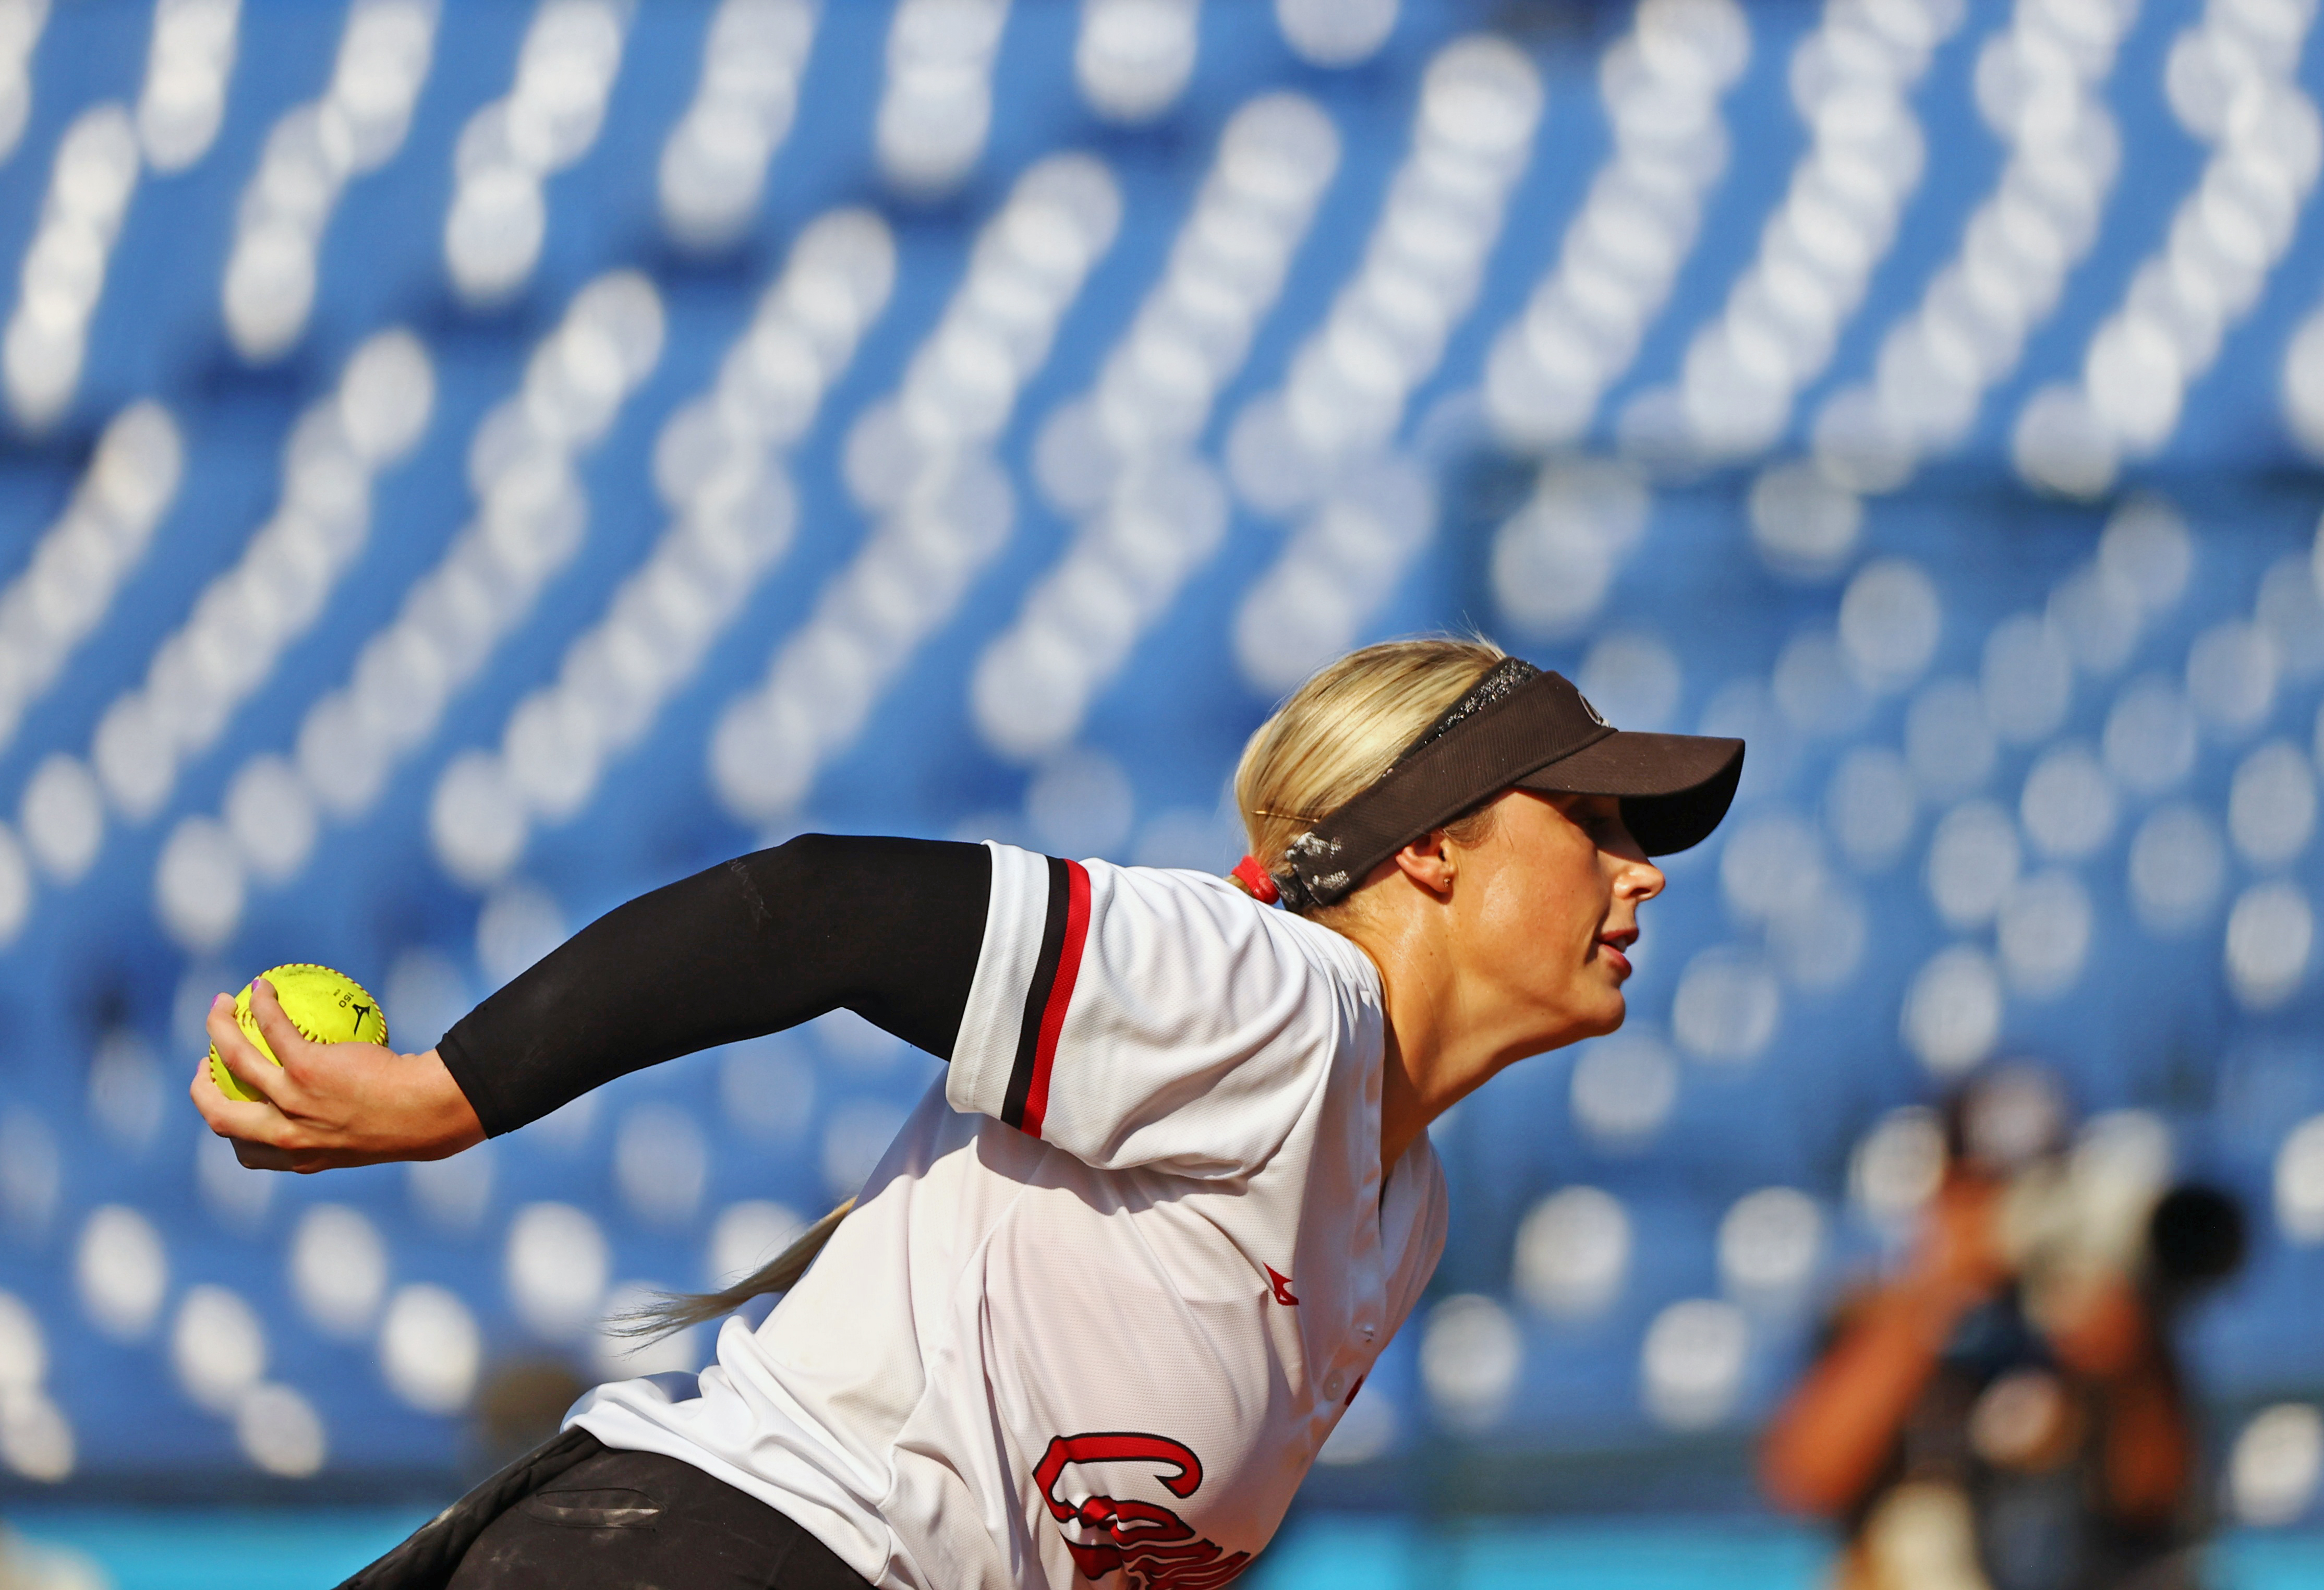 Tokyo 2020 Olympics - Softball - Women - Opening Round - Canada v Japan - Yokohama Baseball Stadium - Yokohama, Japan - July 25, 2021. Danielle Lawrie of Canada in action. REUTERS/Jorge Silva